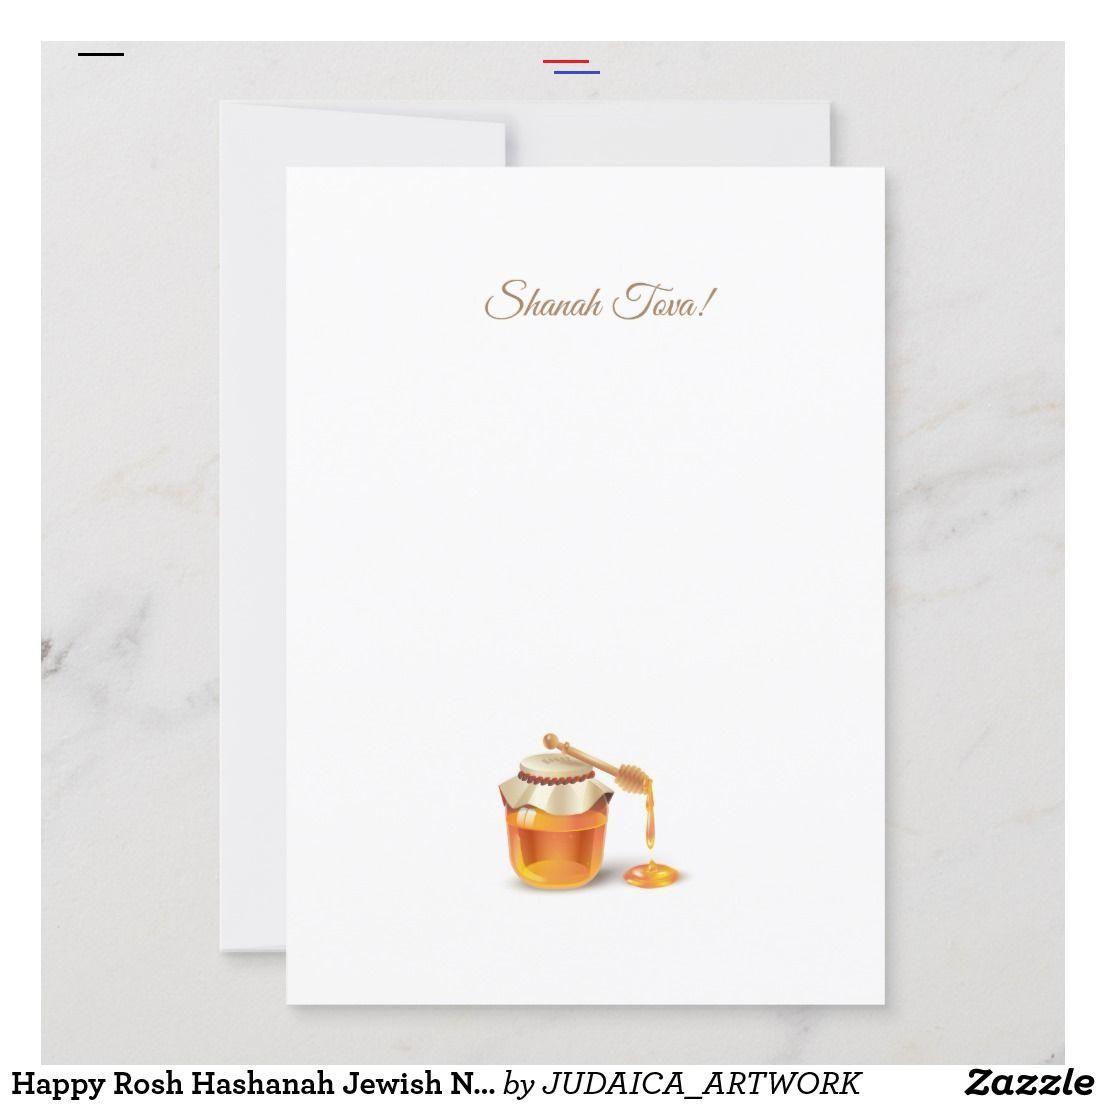 Happy Rosh Hashanah Jewish New Year Greeting Card Zazzle Com Happyroshhashanah Happy Rosh Hashanah Hebrew Text Shana Tova Jewish New Year Holiday Symbo Em 2020